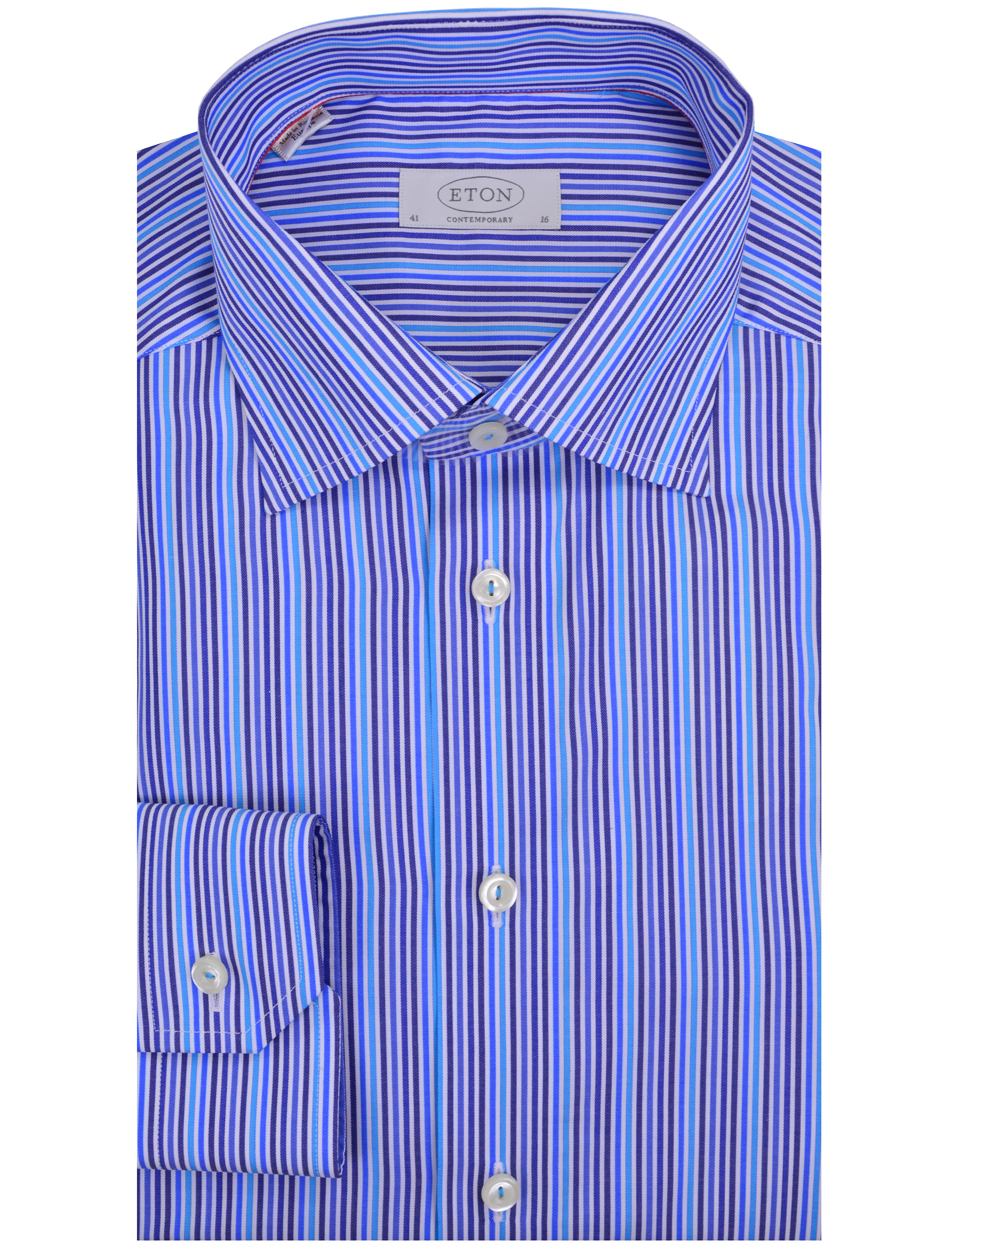 Eton Of Sweden Navy And Aqua Stripe Dress Shirt In Blue